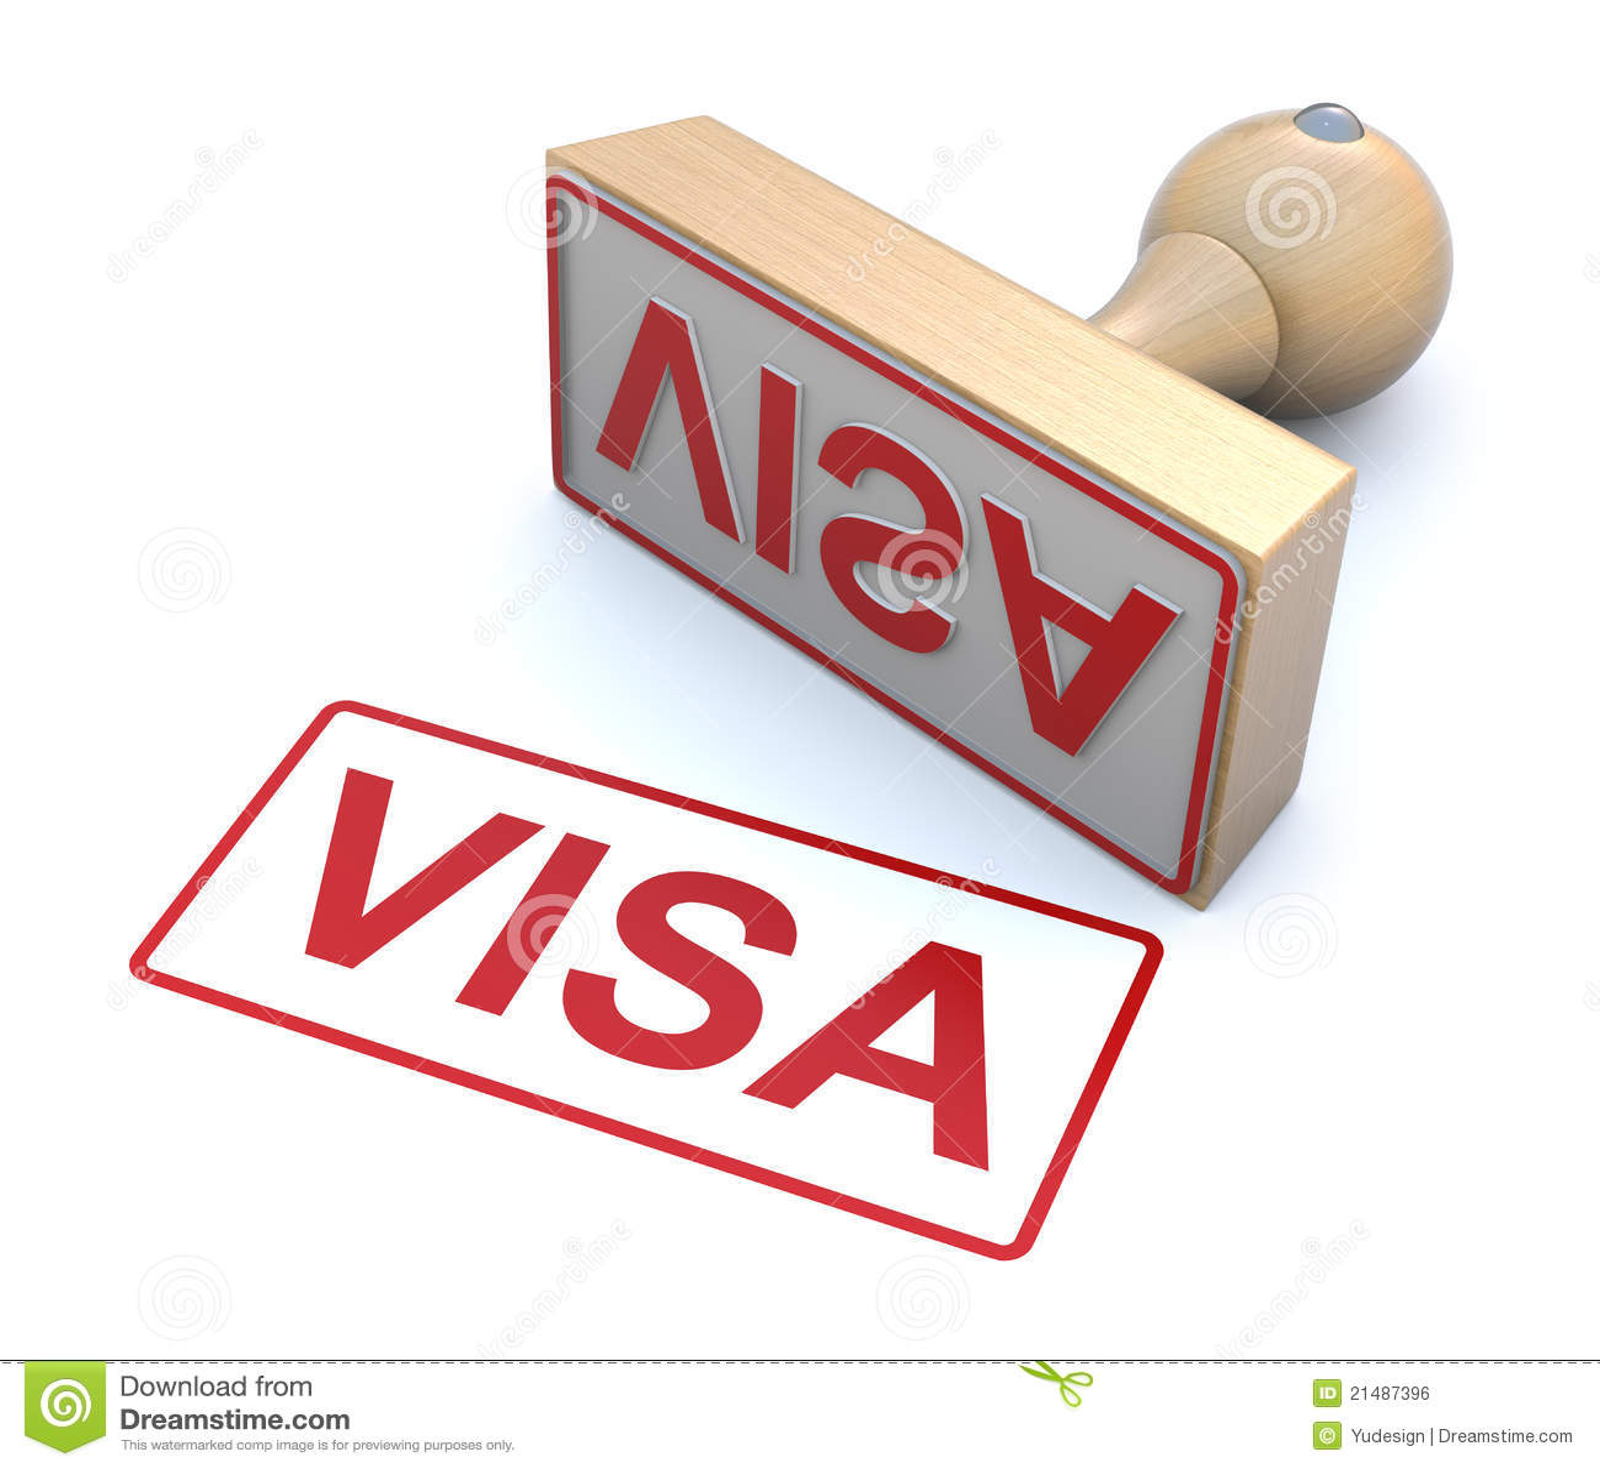 Rubber stamp visa stock illustration illustration of destinations rubber stamp visa biocorpaavc Choice Image